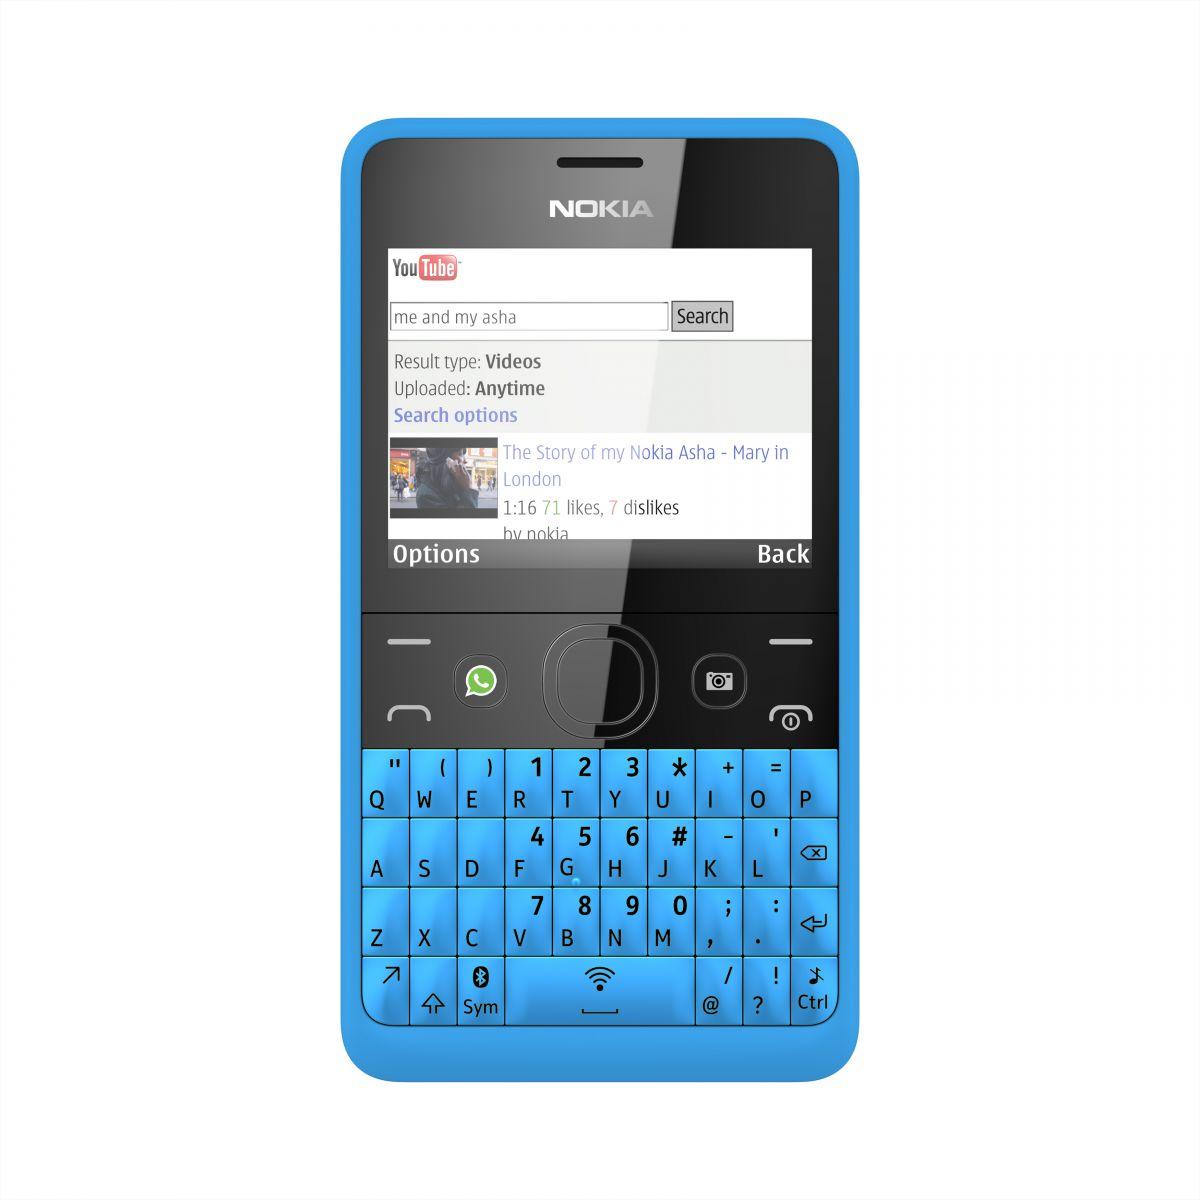 Telechargement whatsapp messenger for nokia - Whatsapp Messenger Free Software Download For Nokia C2 01